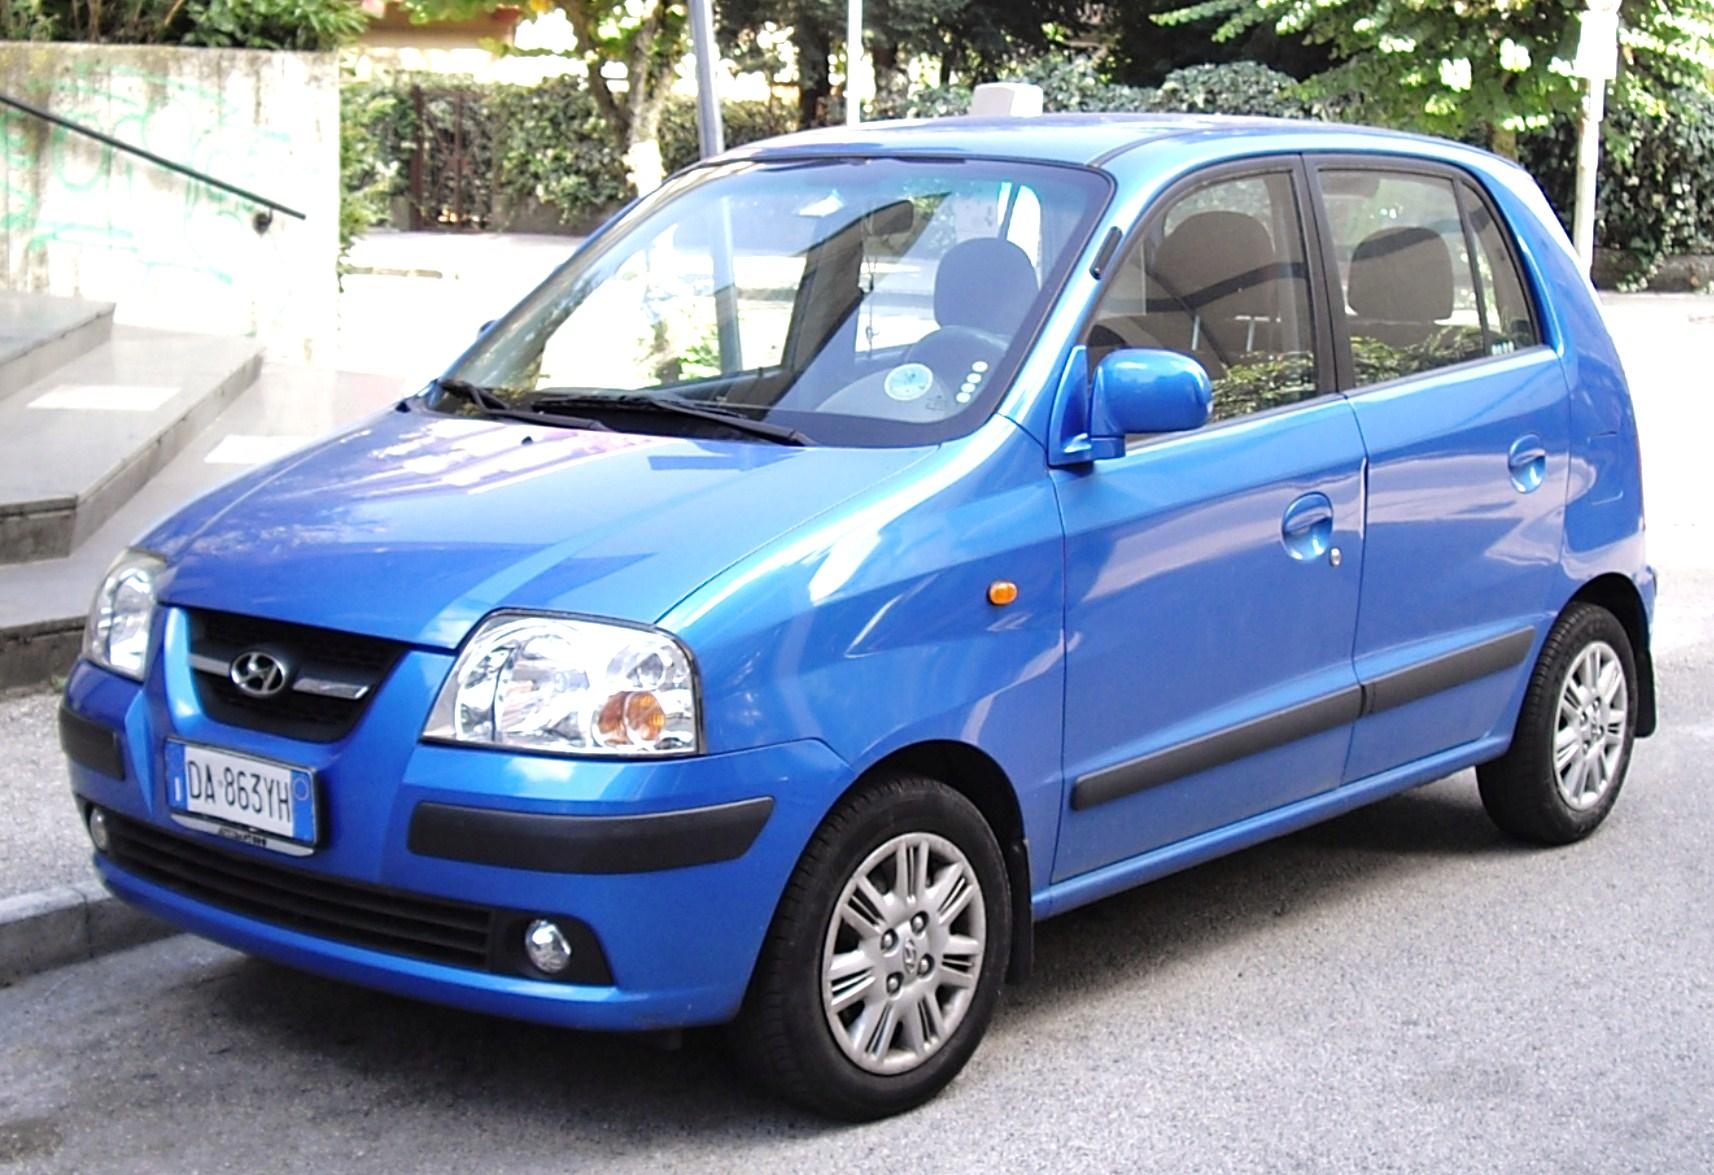 Hyundai Atos Prime 2007